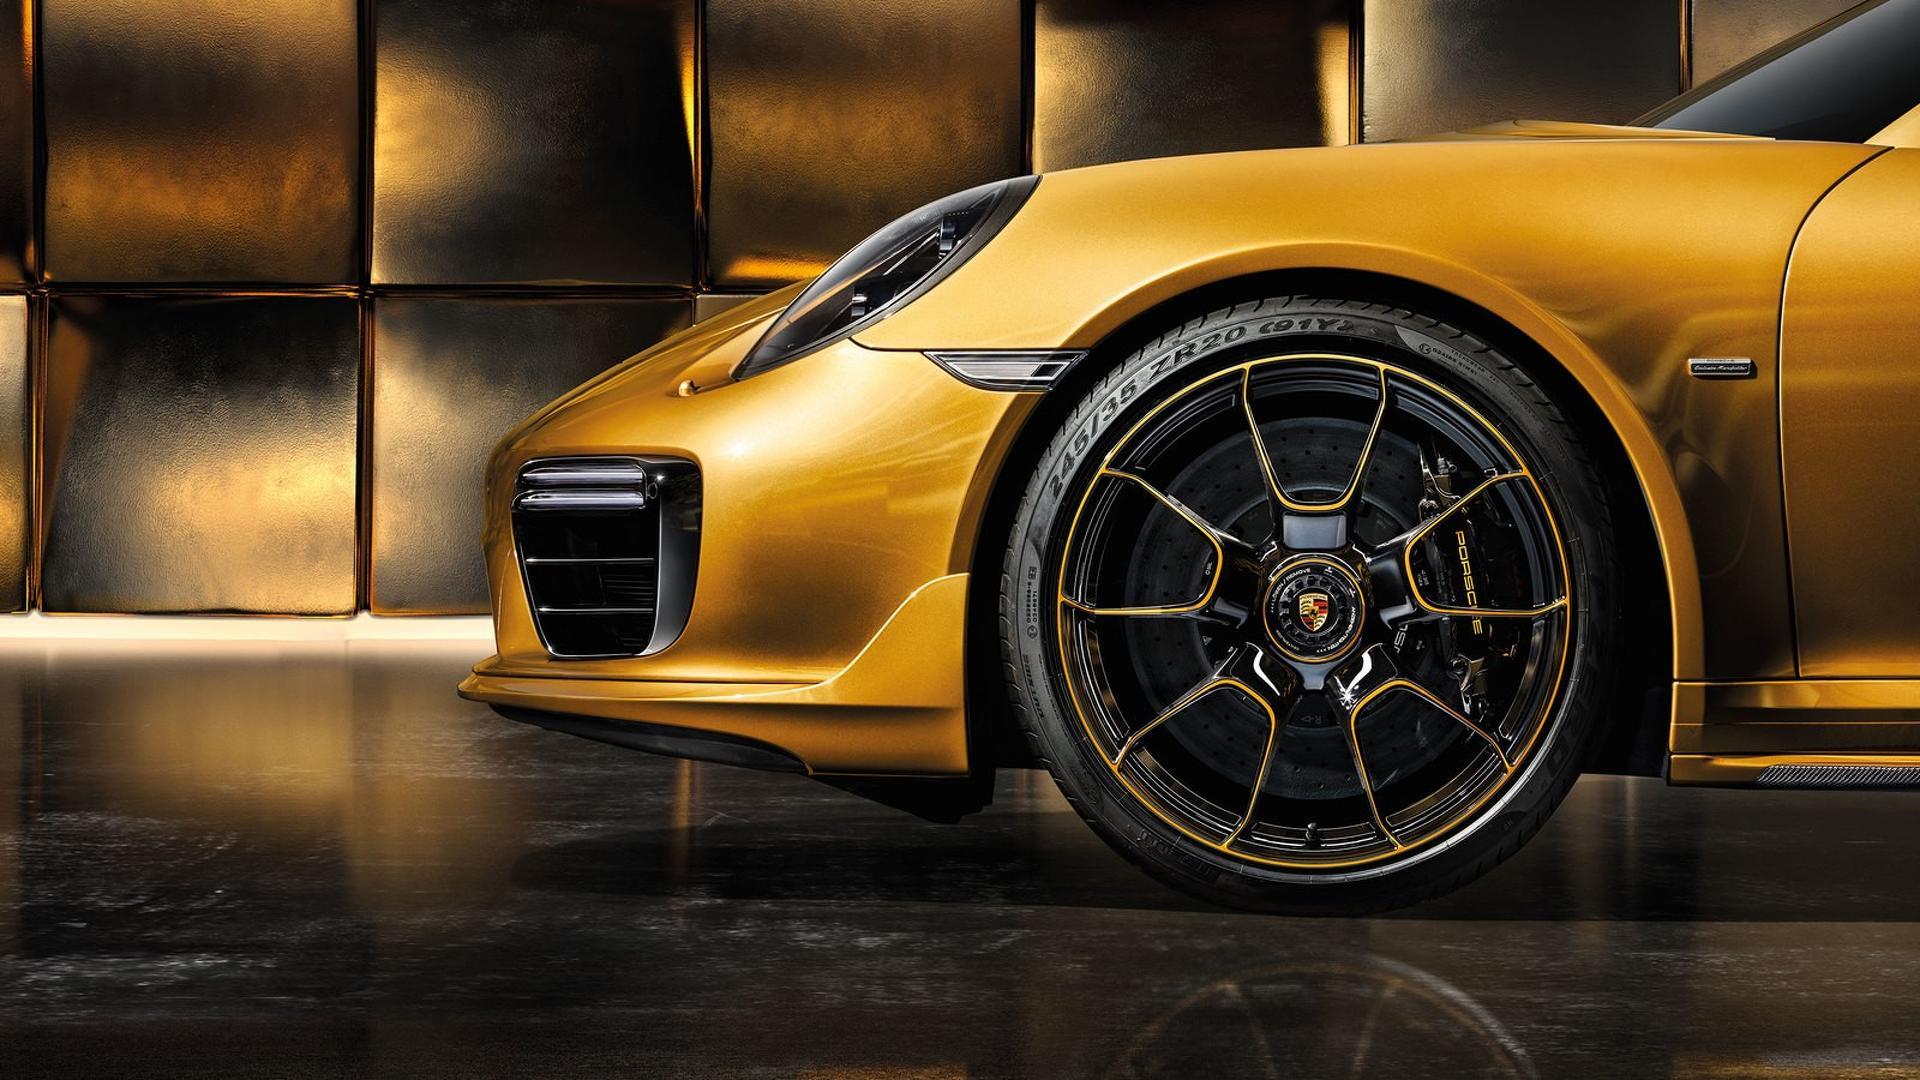 Porsche_911_Turbo_S_Exclusive_Series_14